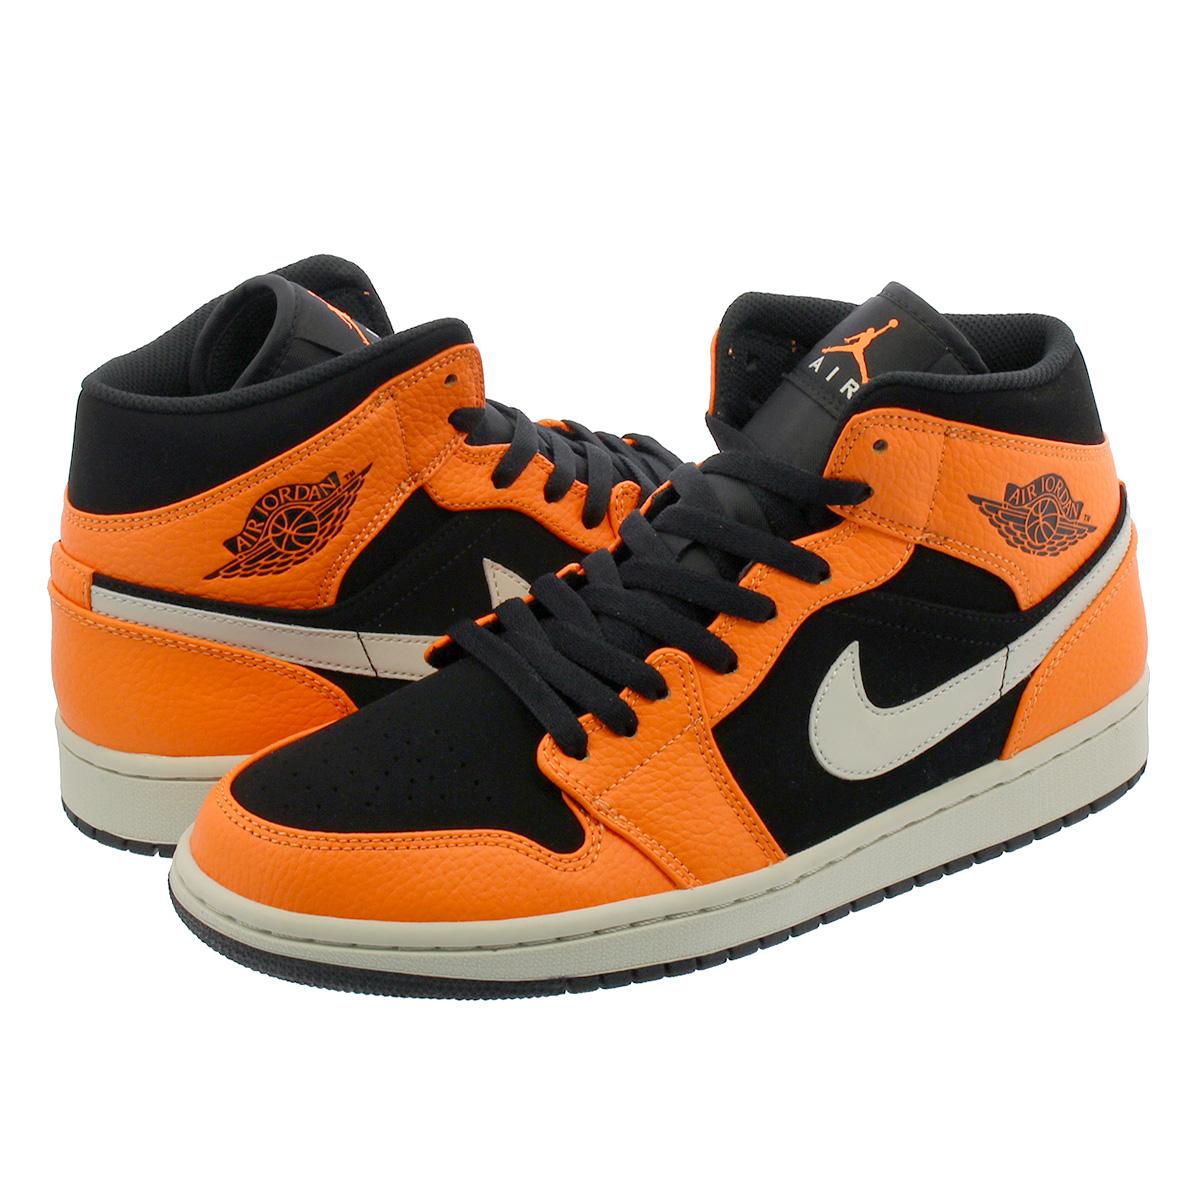 c7ca79710433ca NIKE AIR JORDAN 1 MID Nike Air Jordan 1 mid BLACK CONE LIGHT BONE ORANGE  554